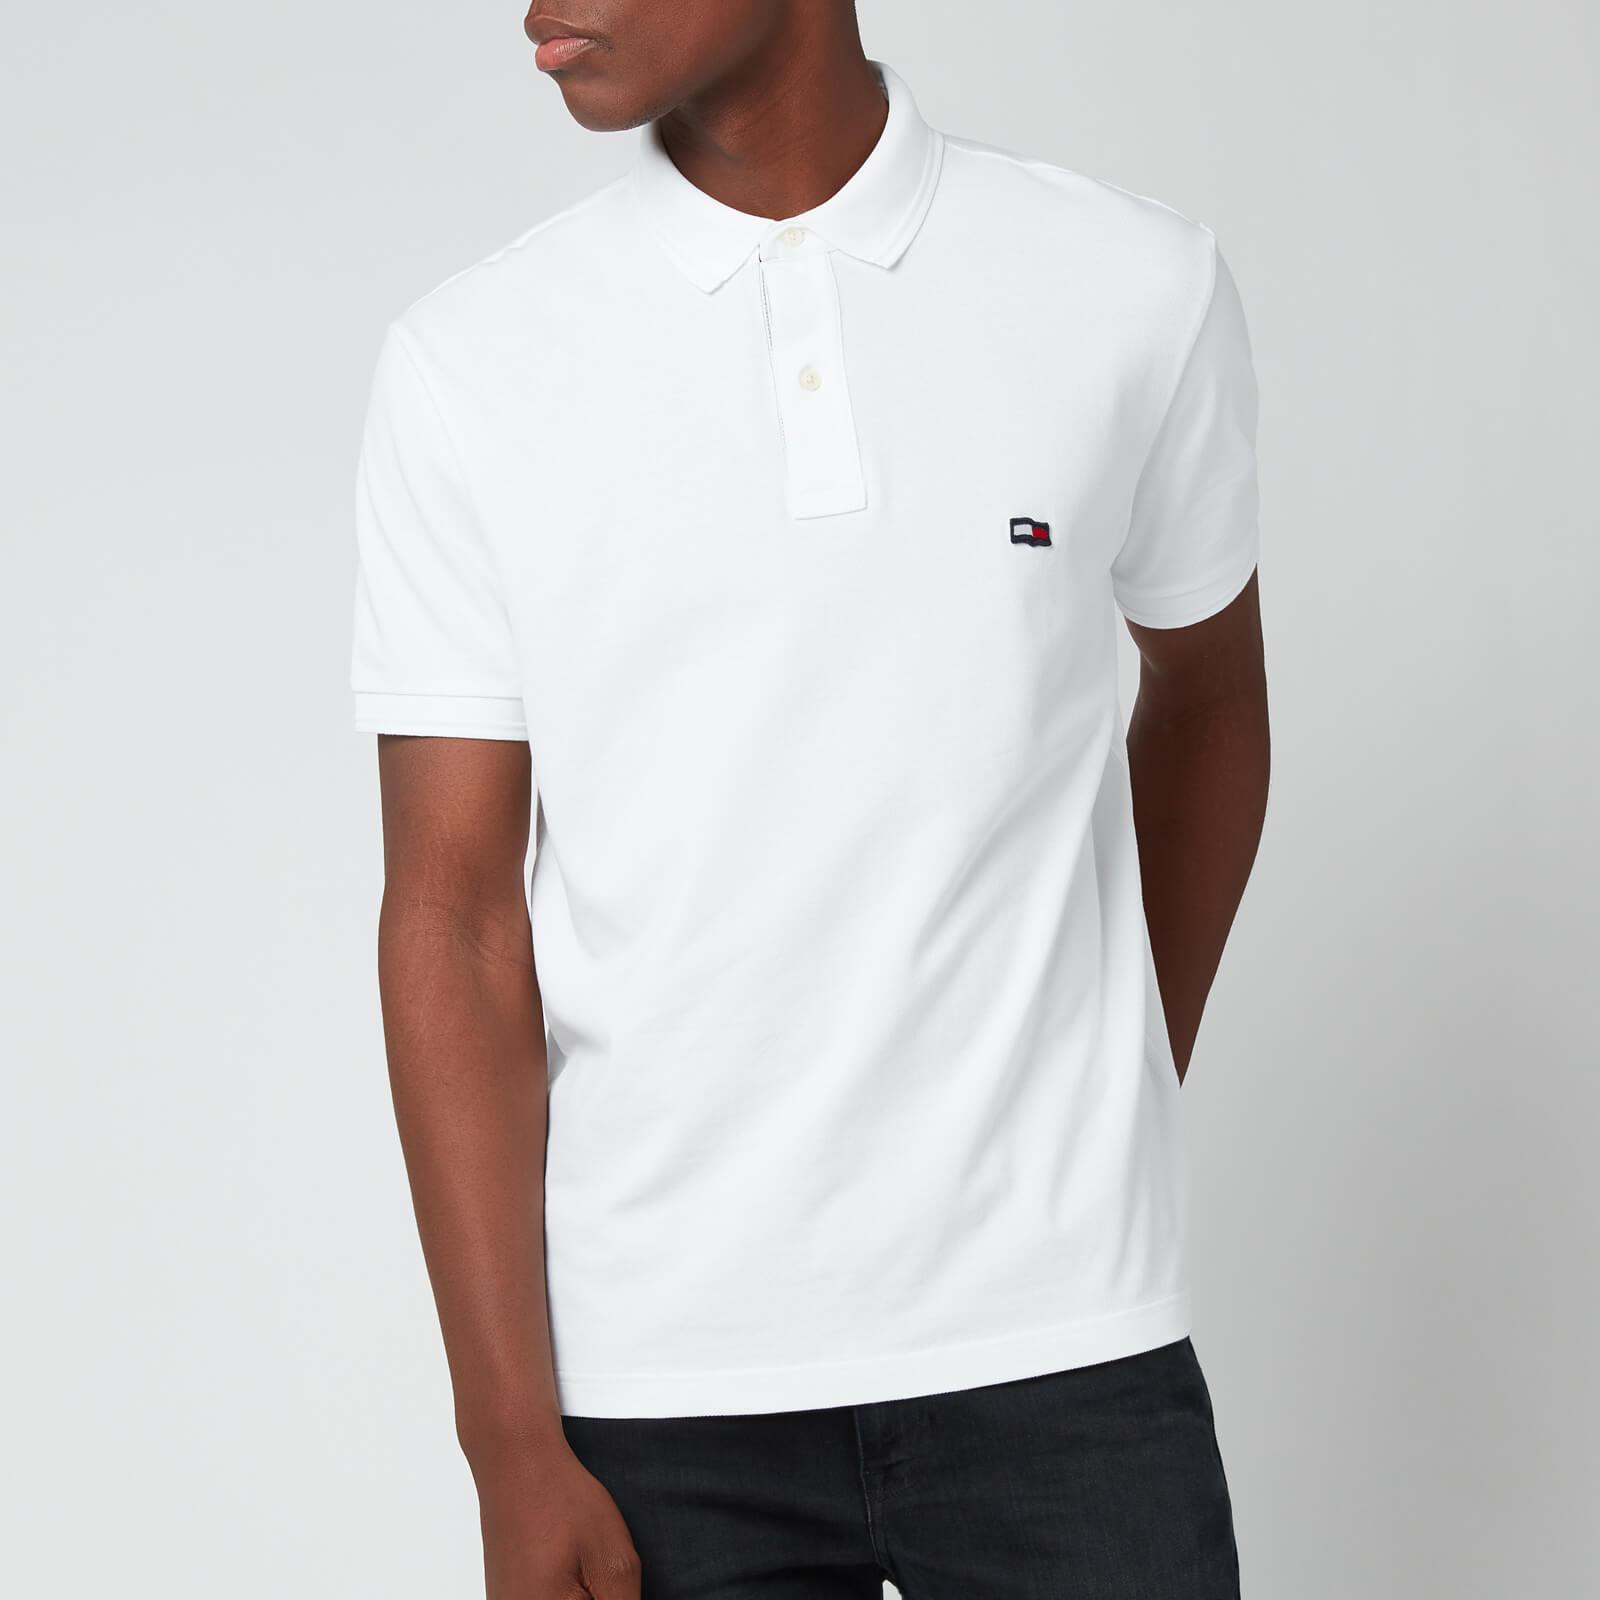 Tommy Hilfiger Men's Wavy Flag Polo Shirt - White - S